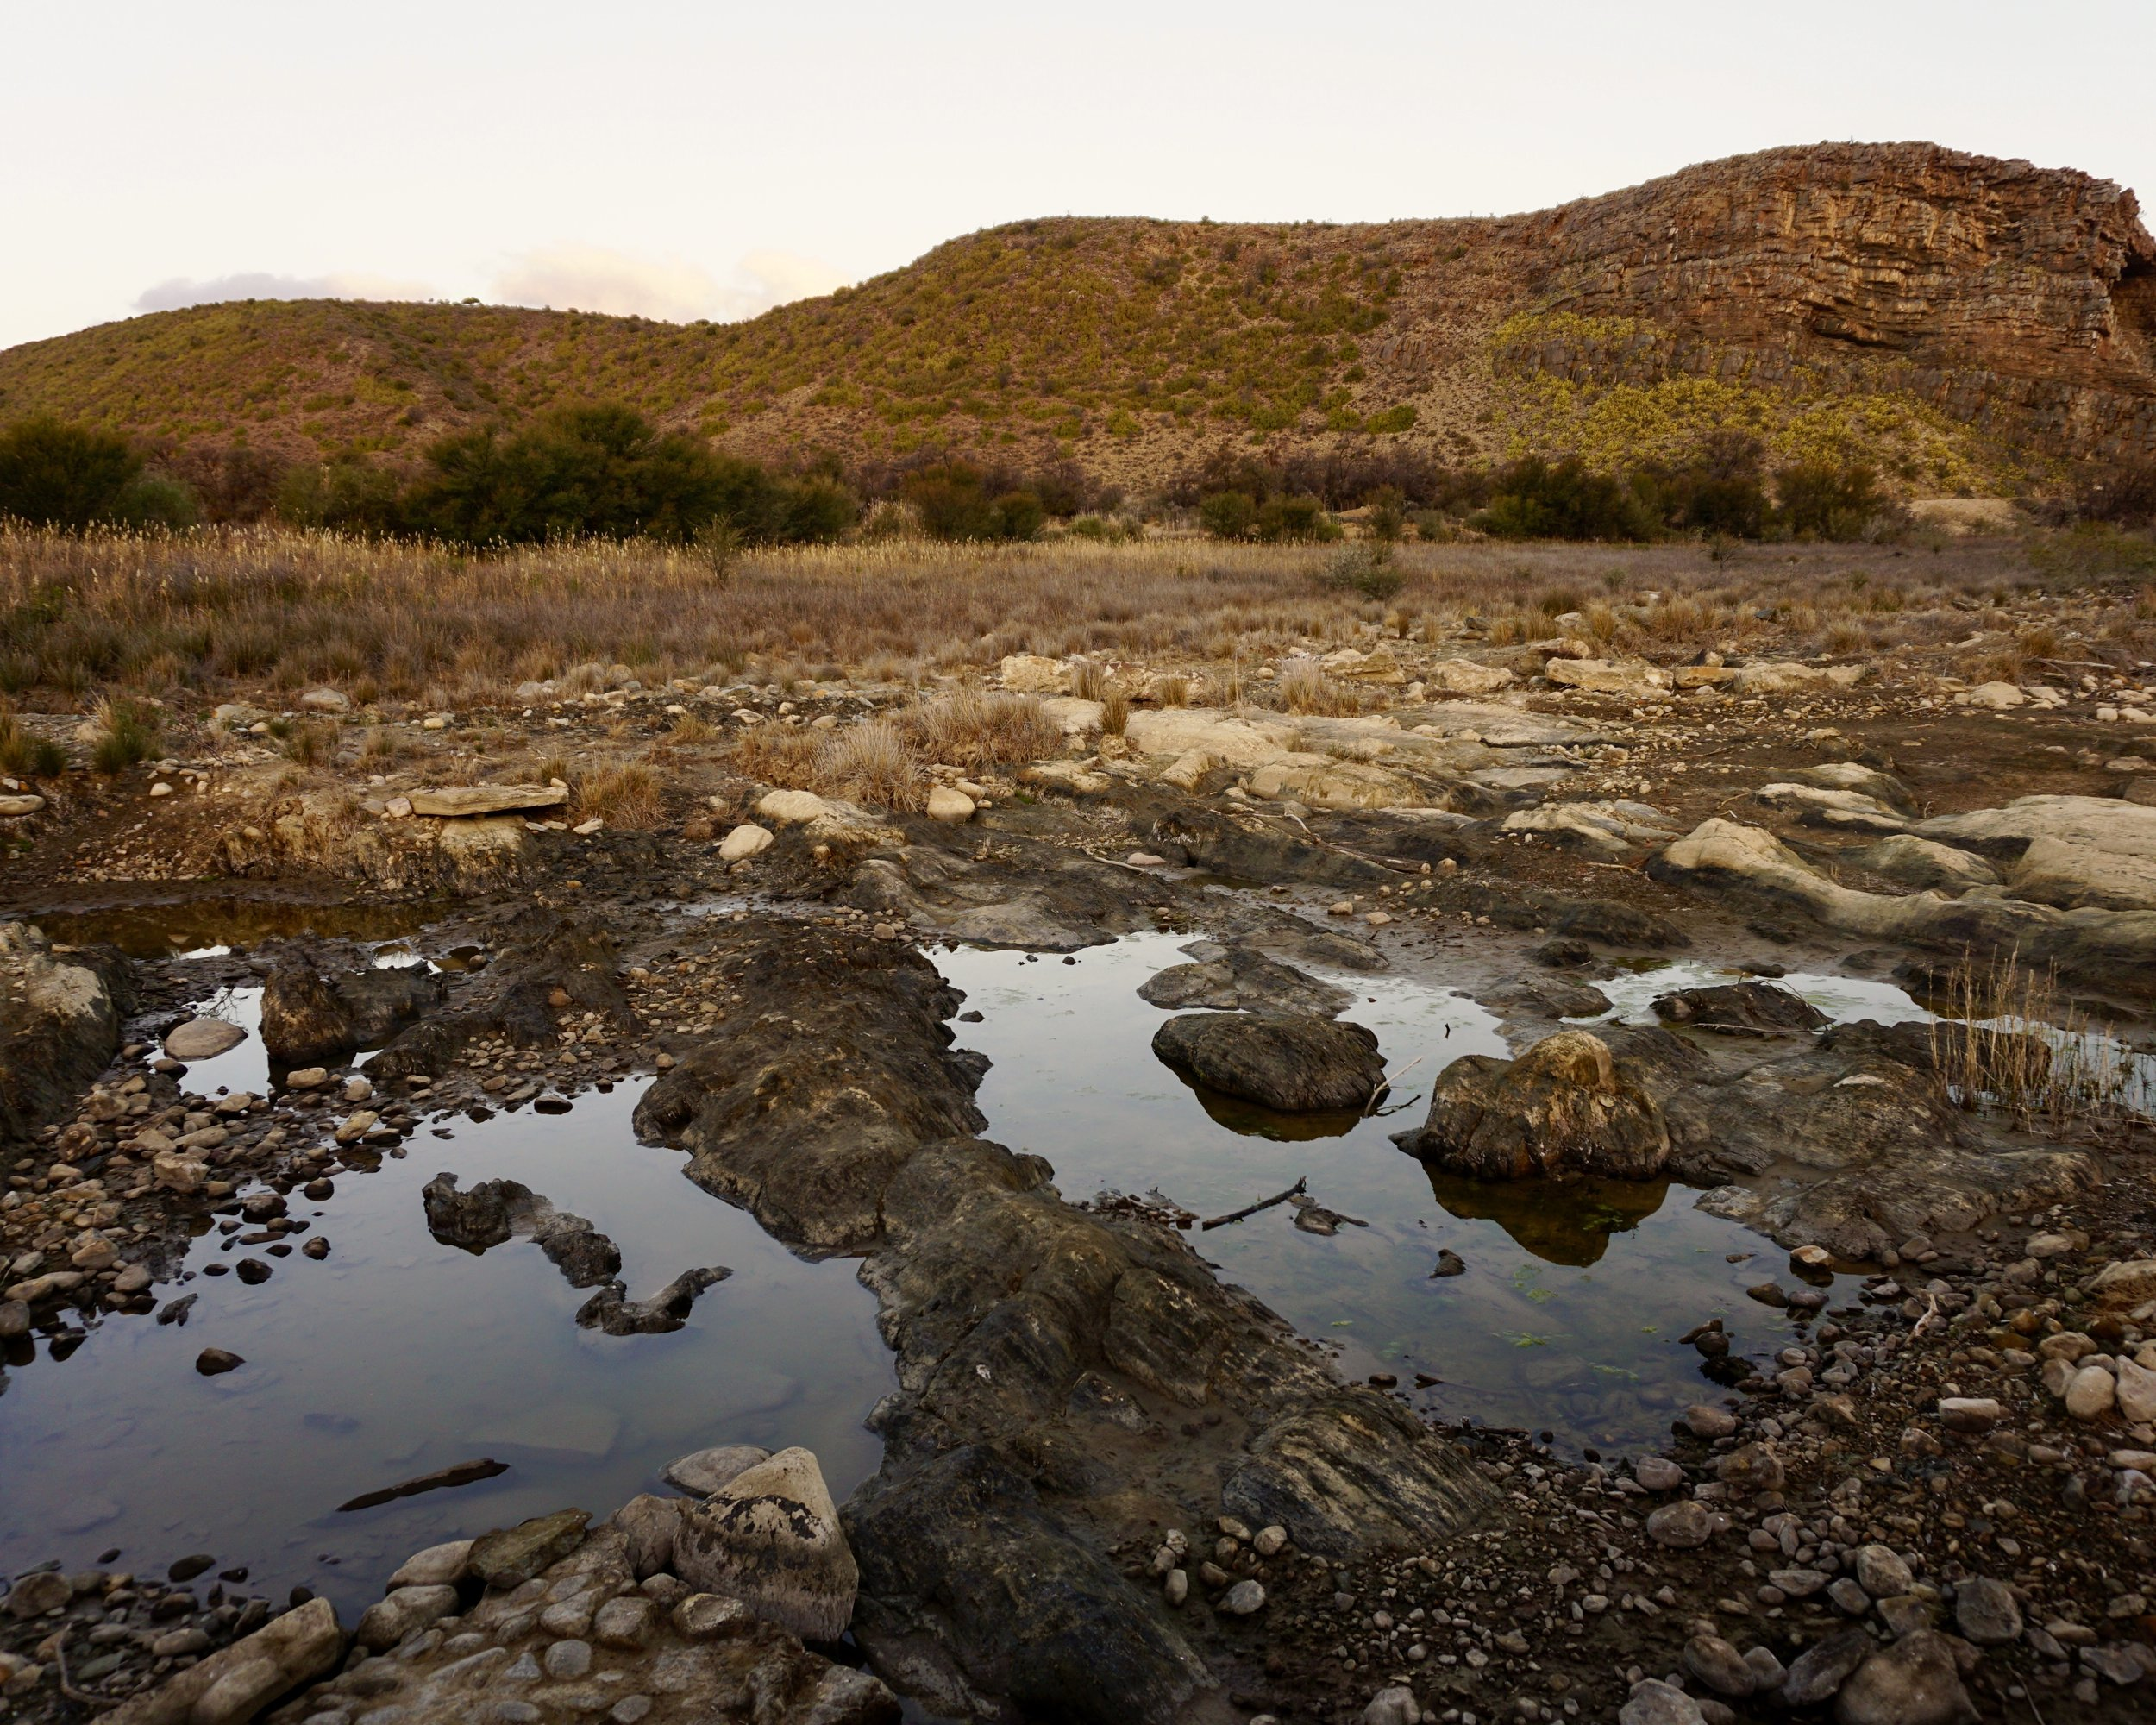 Klein Karoo: Dry River Bed